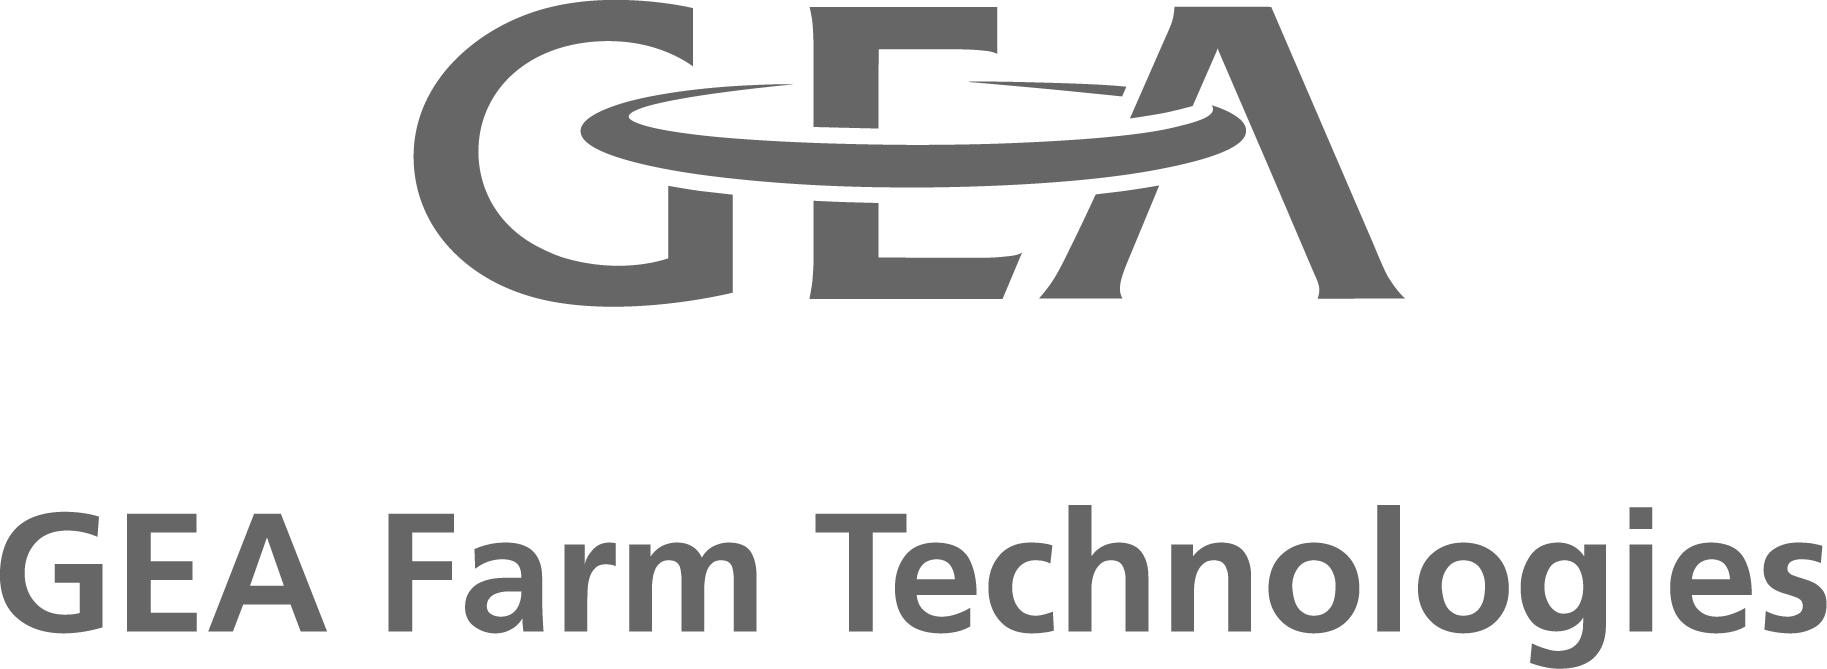 GEA Farm Technologies.